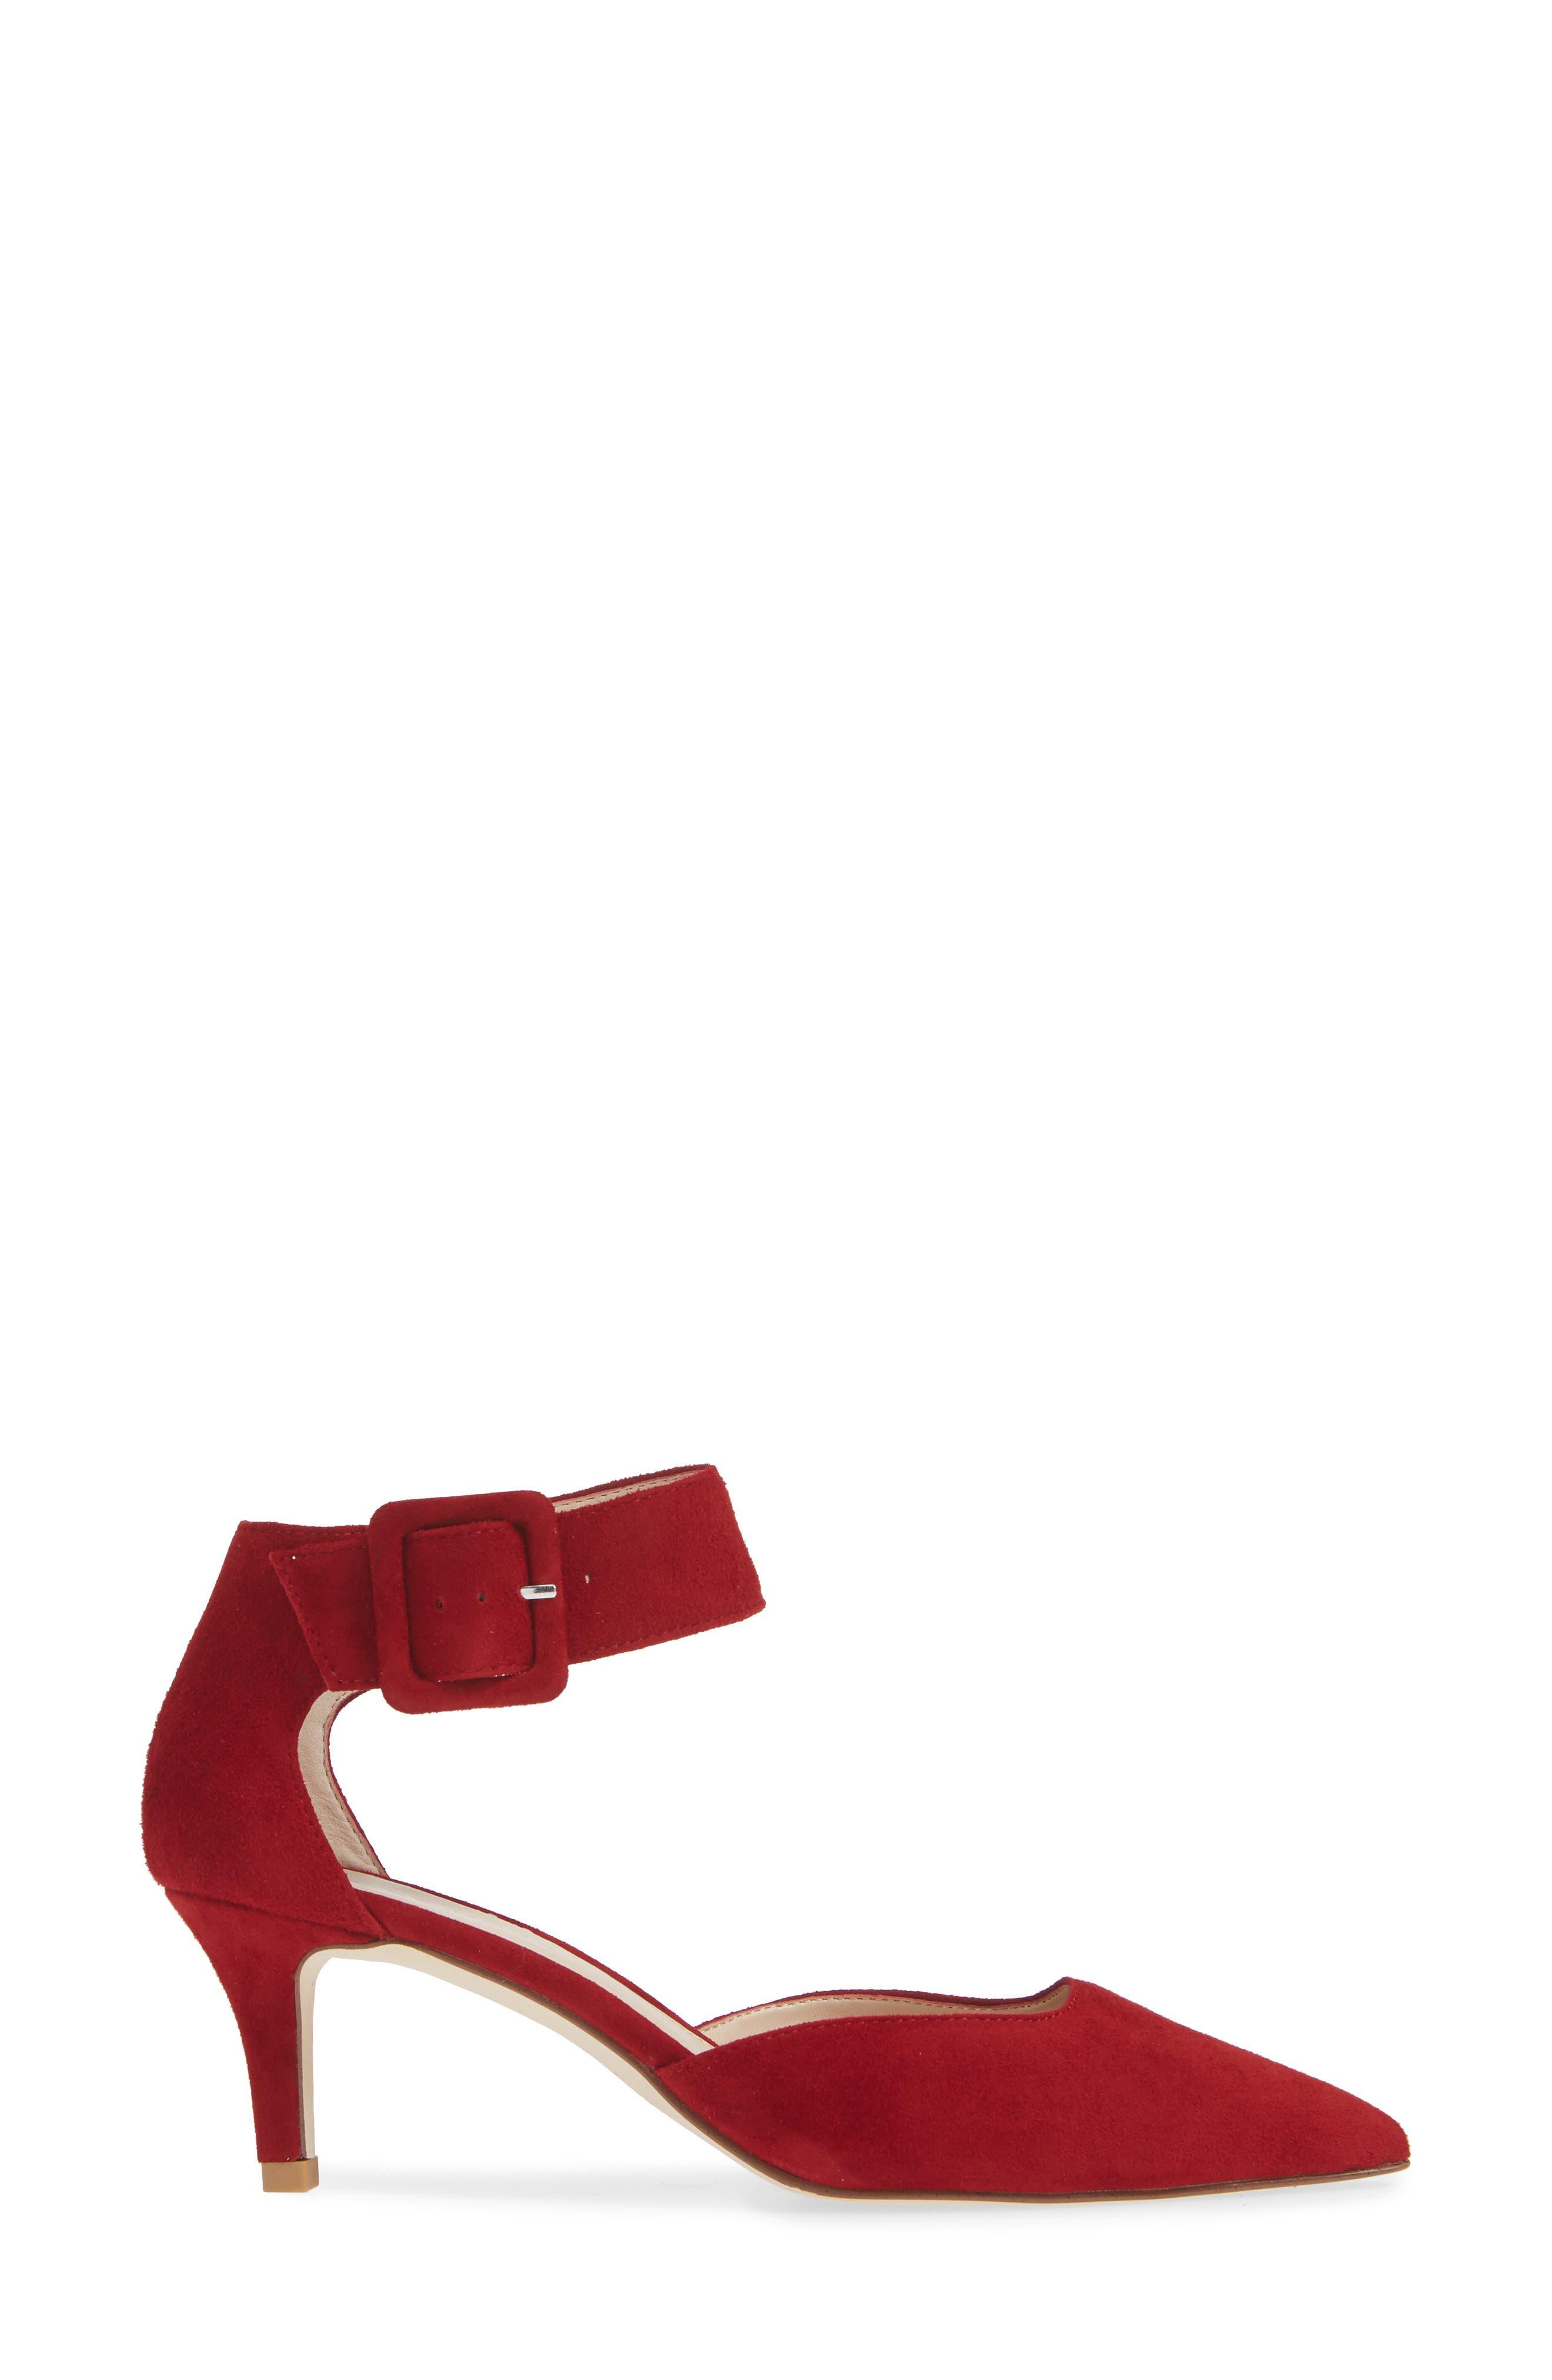 Kenley Ankle Strap Pump,                             Alternate thumbnail 3, color,                             SCARLET SUEDE